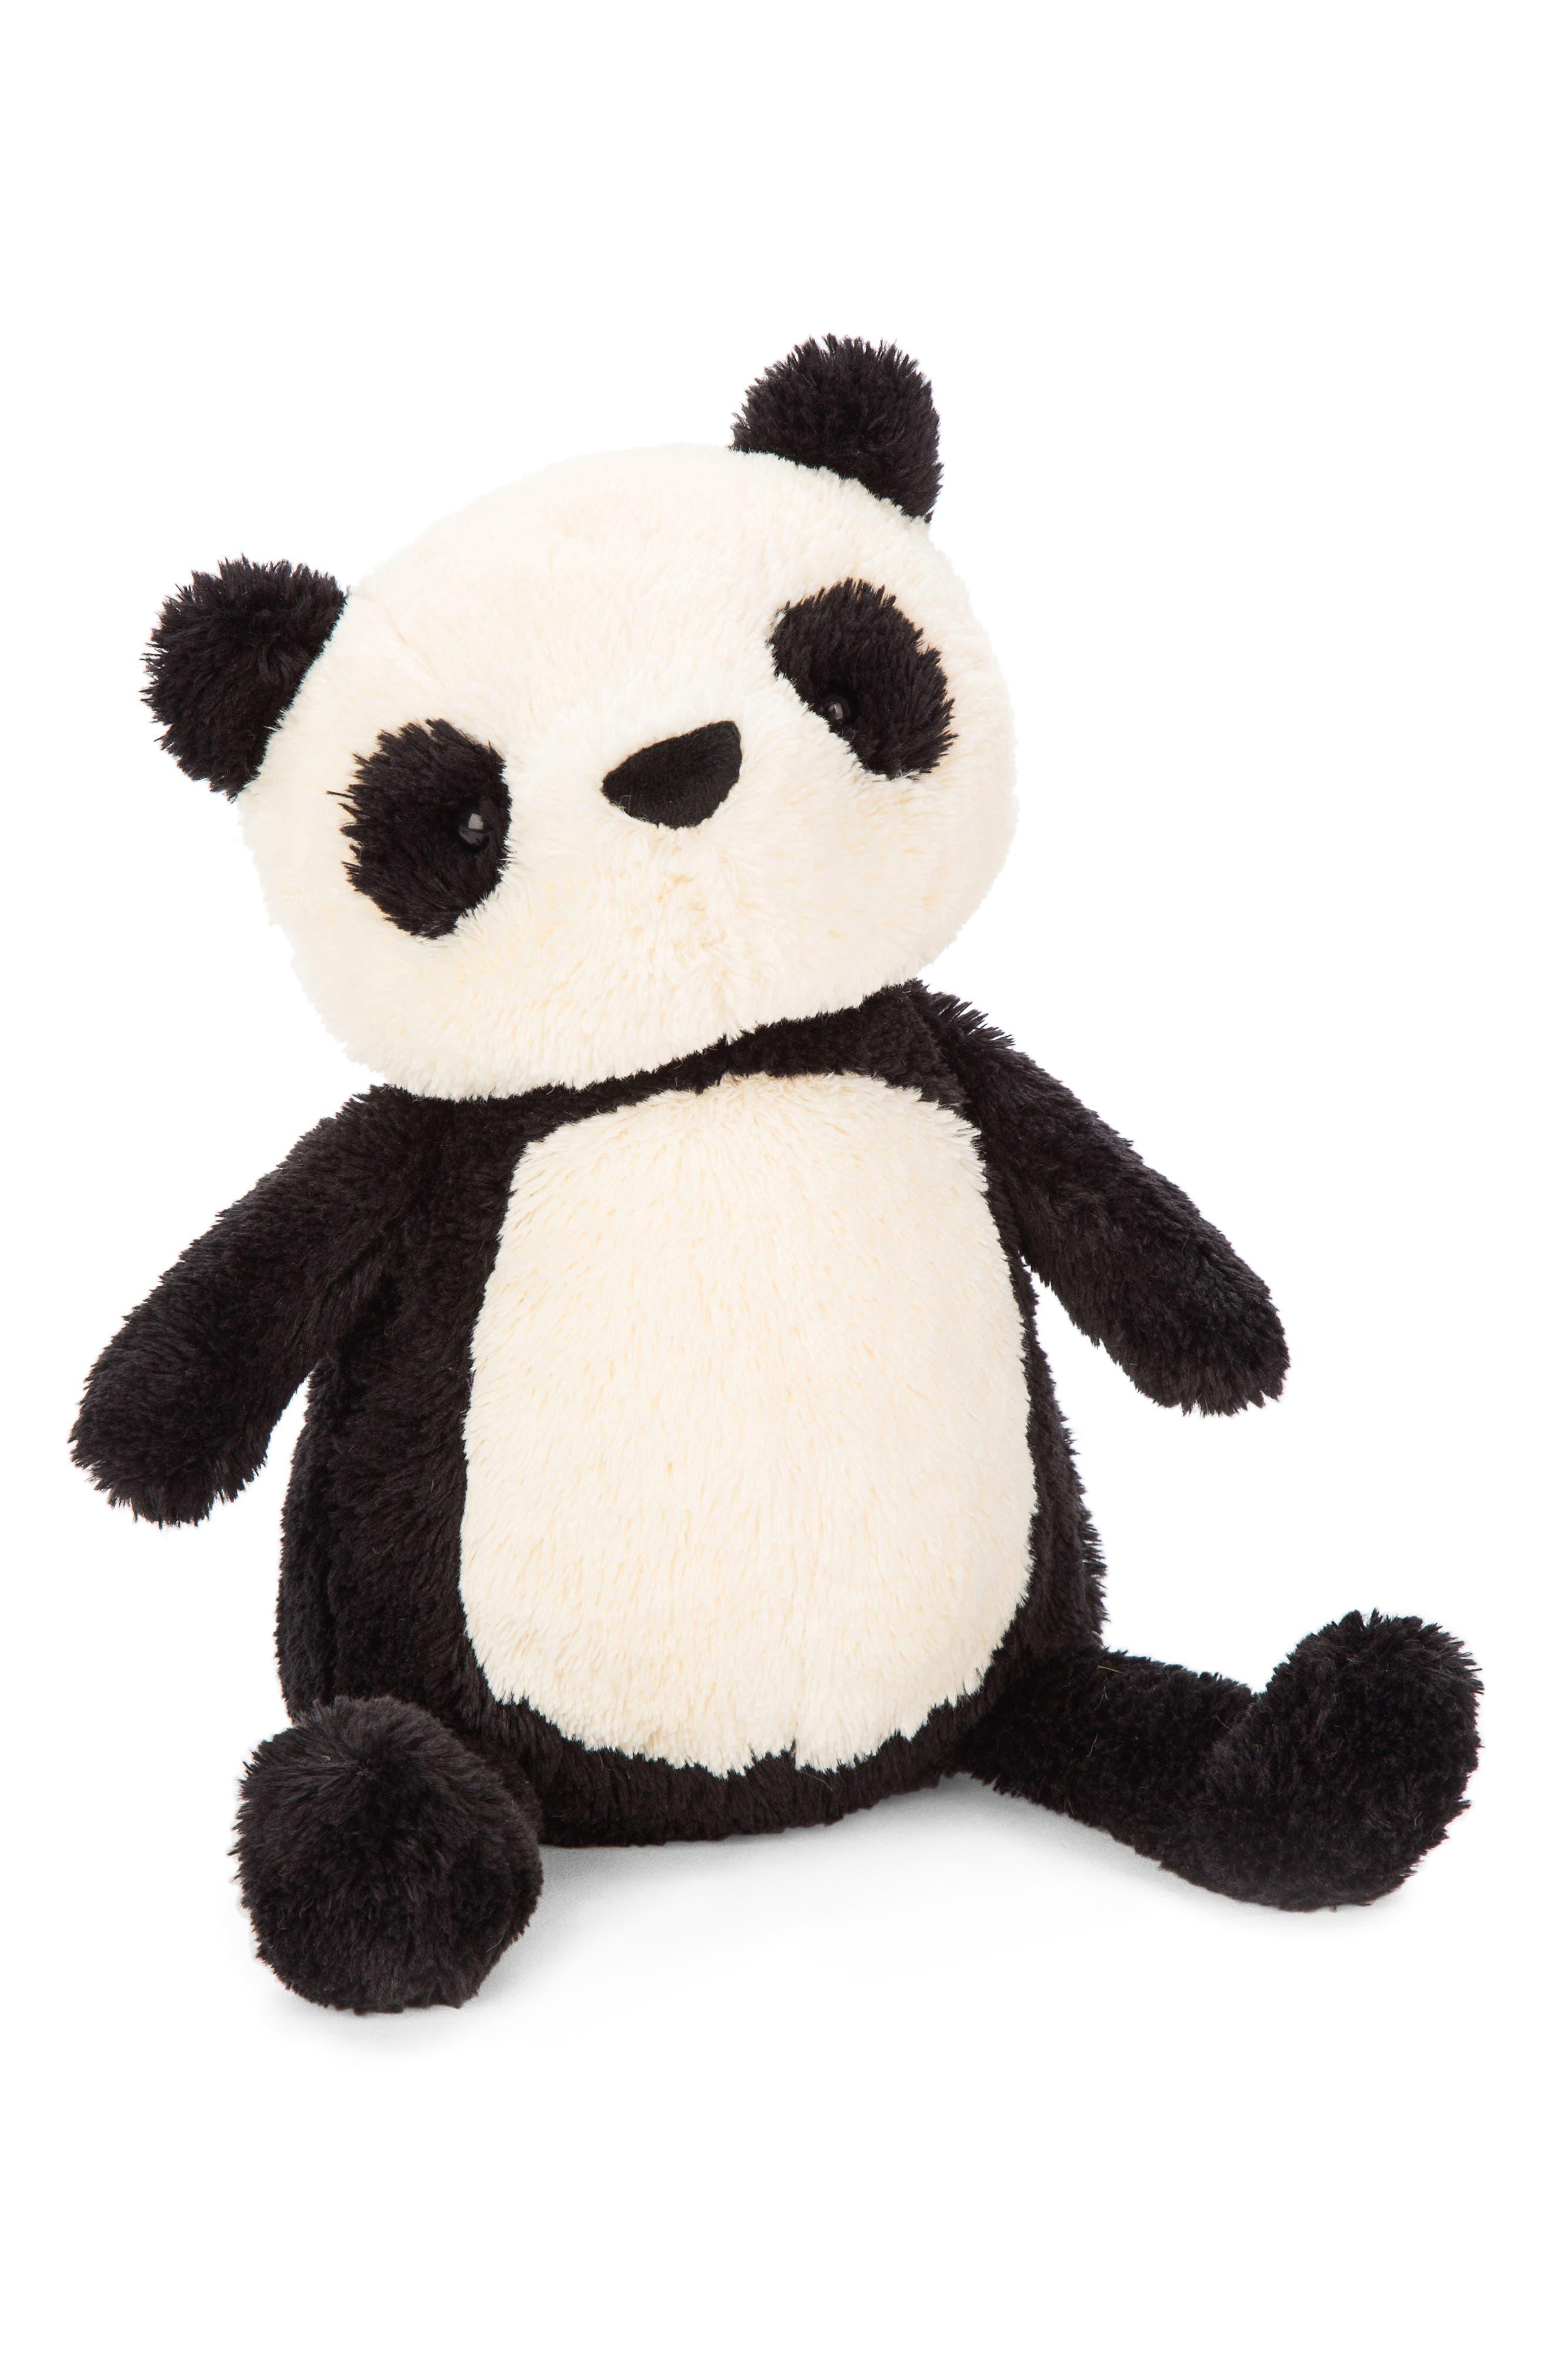 Medium Pippet Panda Stuffed Animal,                             Main thumbnail 1, color,                             BLACK / WHITE